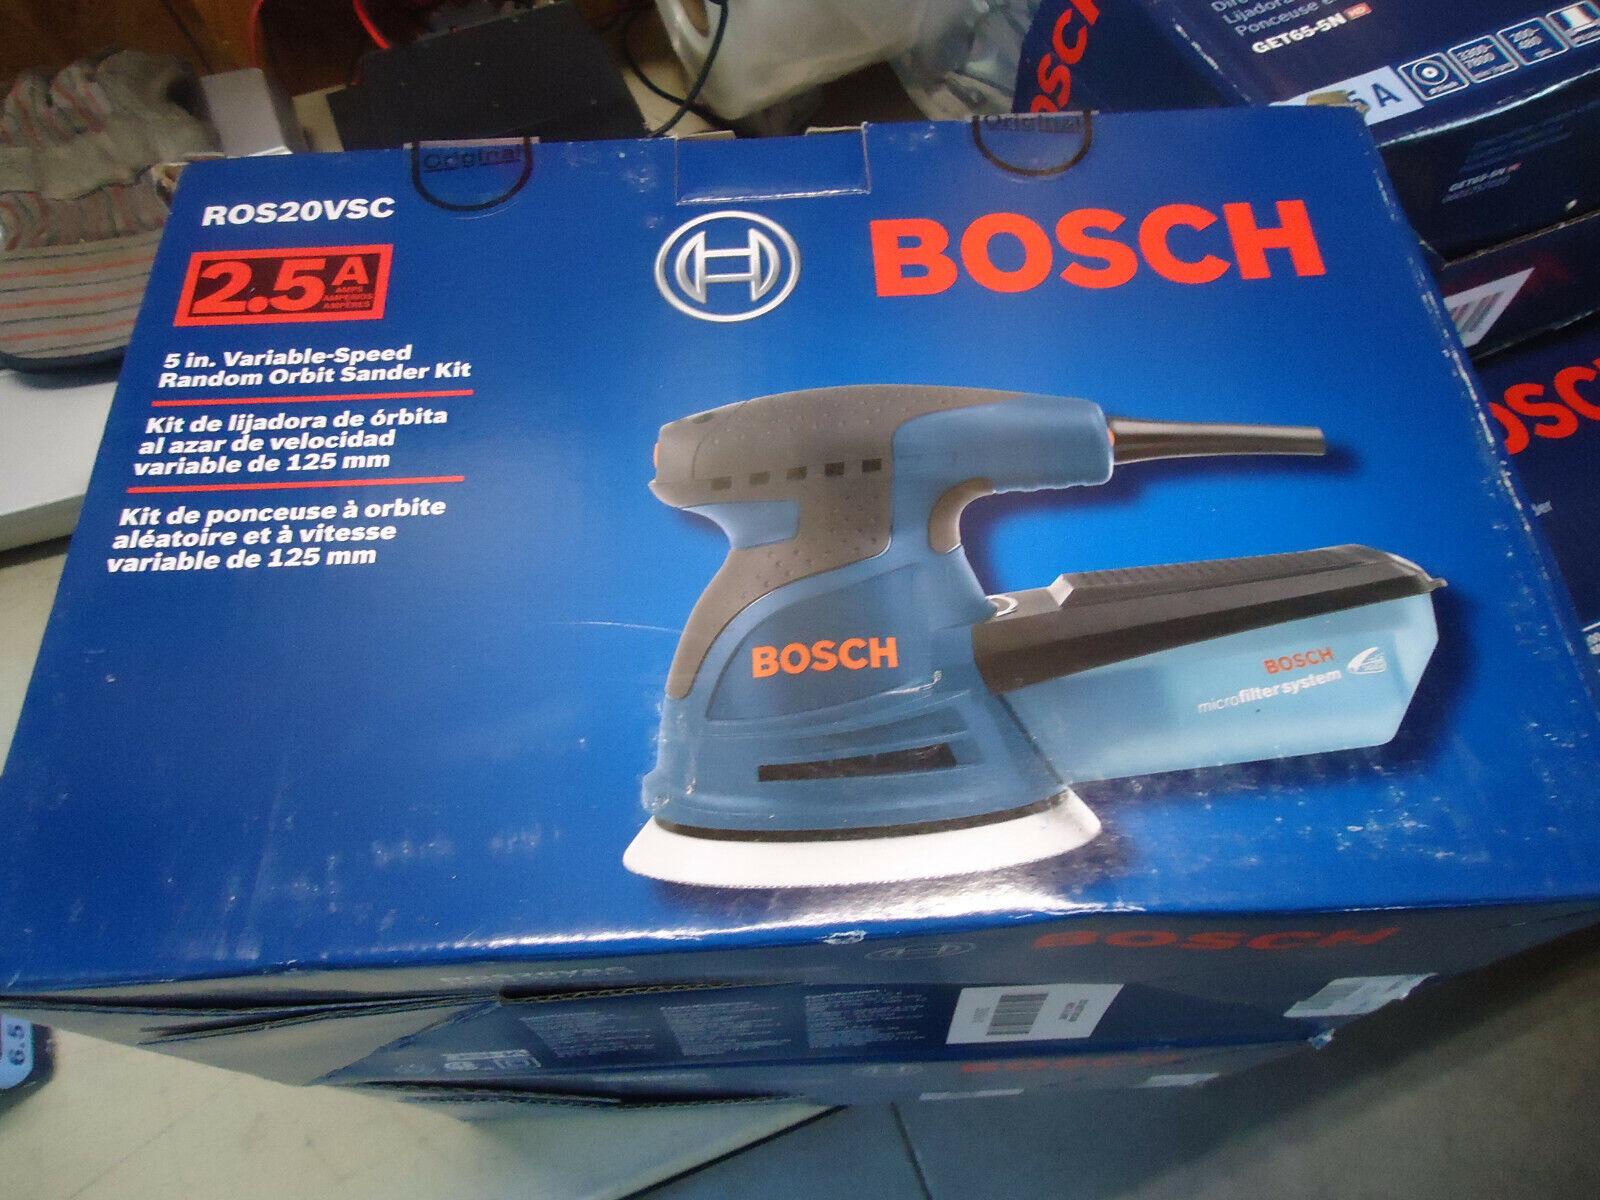 Bosch ROS20VSC Random Orbit Sander with Carrying Bag 5-Inch Blue